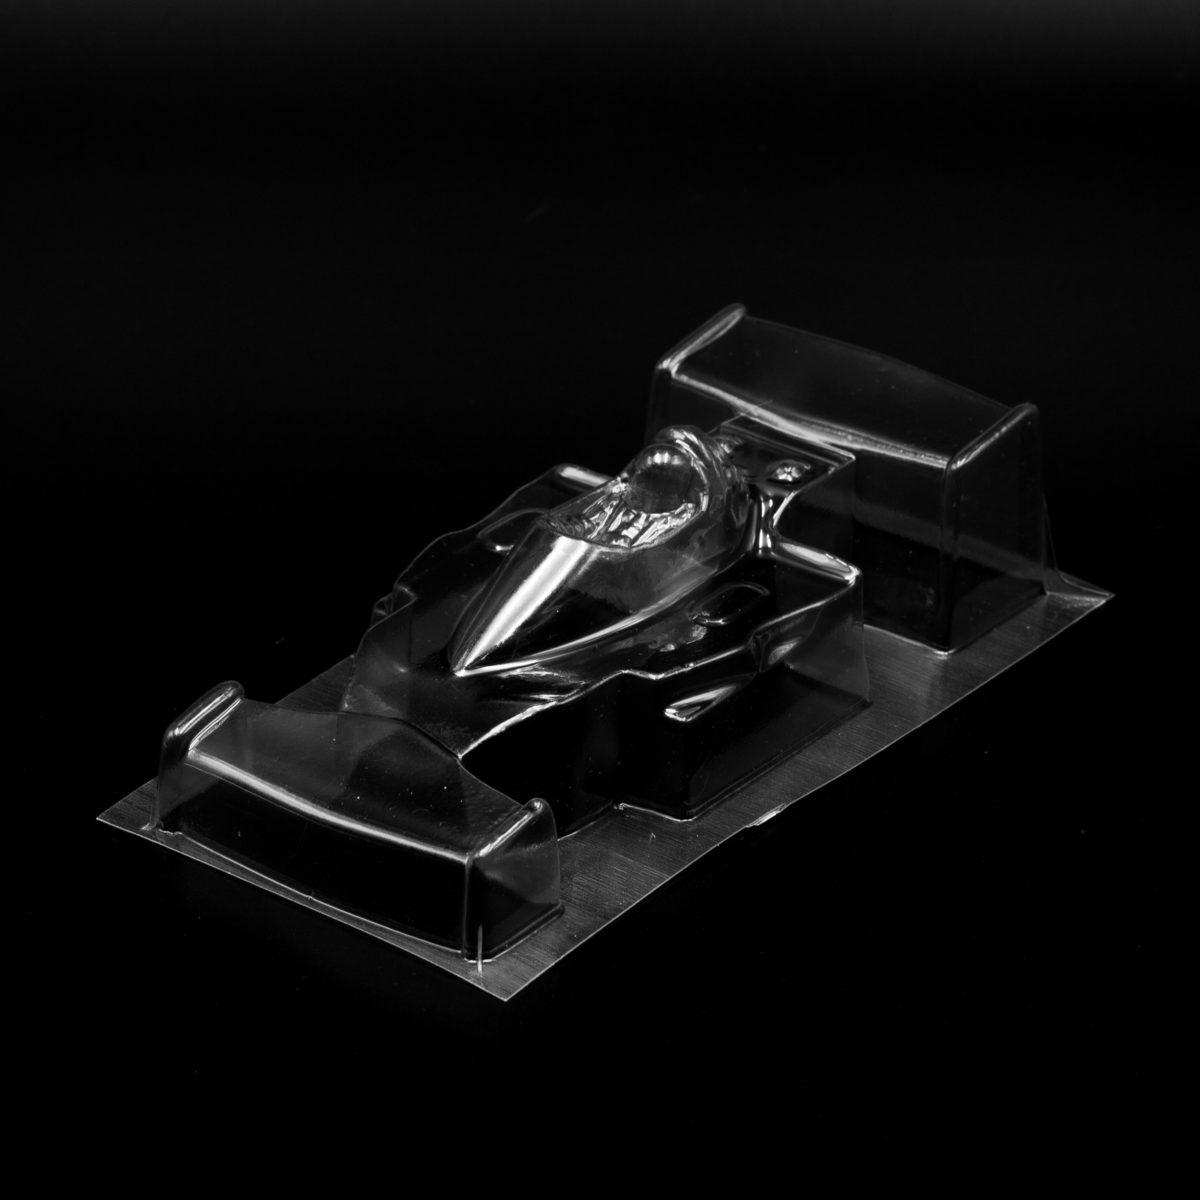 Carrozzeria Slot Car Ferrari F1 1/32 Trasparente Replica Minidream